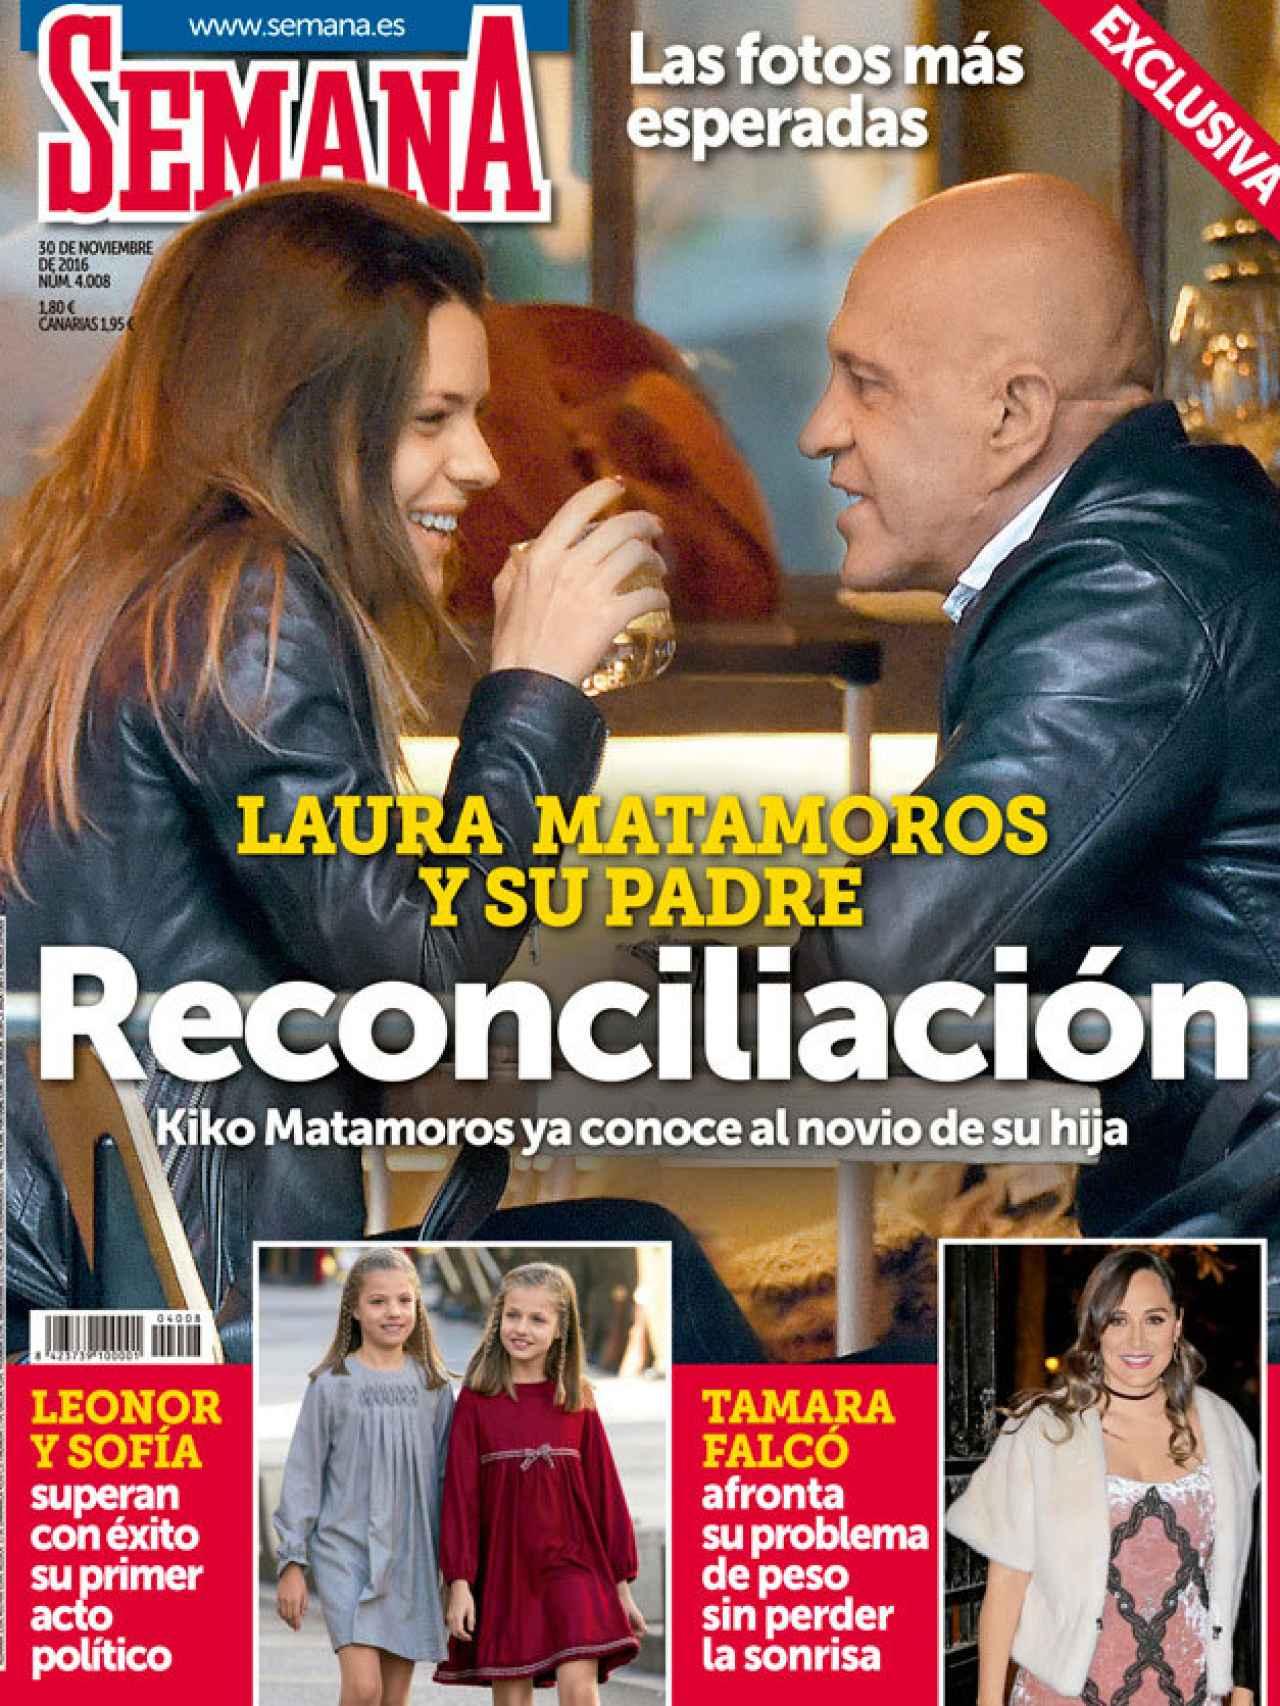 Portada de la revista Semana de hoy.